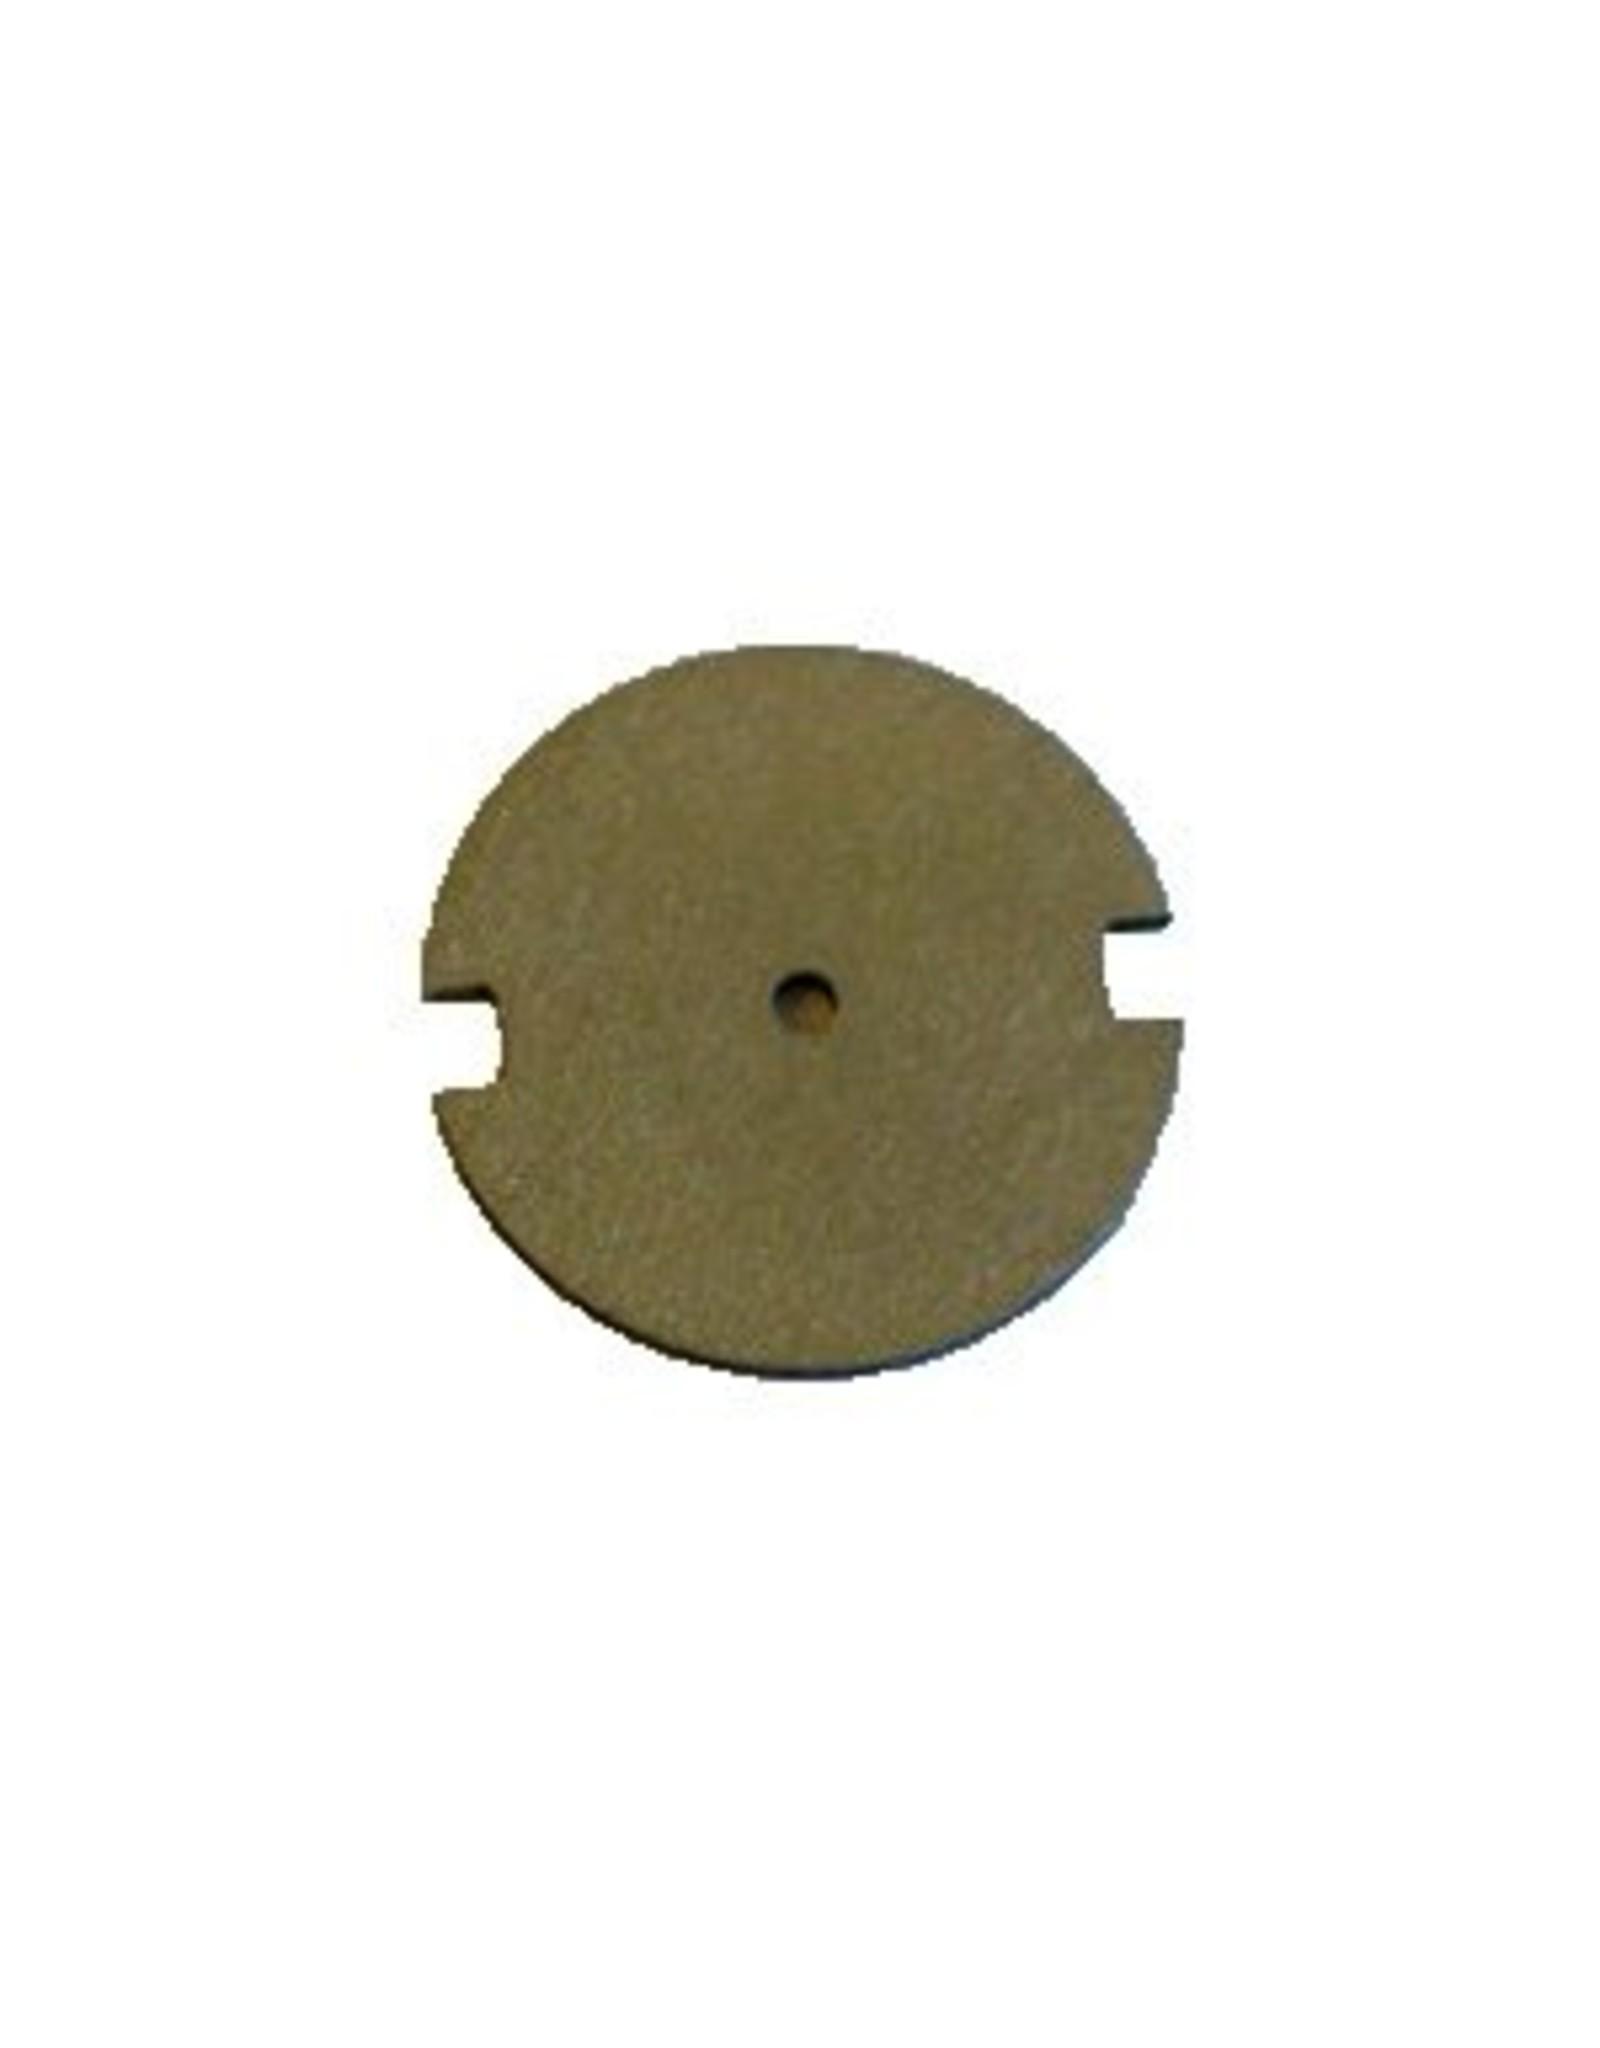 Tungsten sputter shield for FEI FIB columns